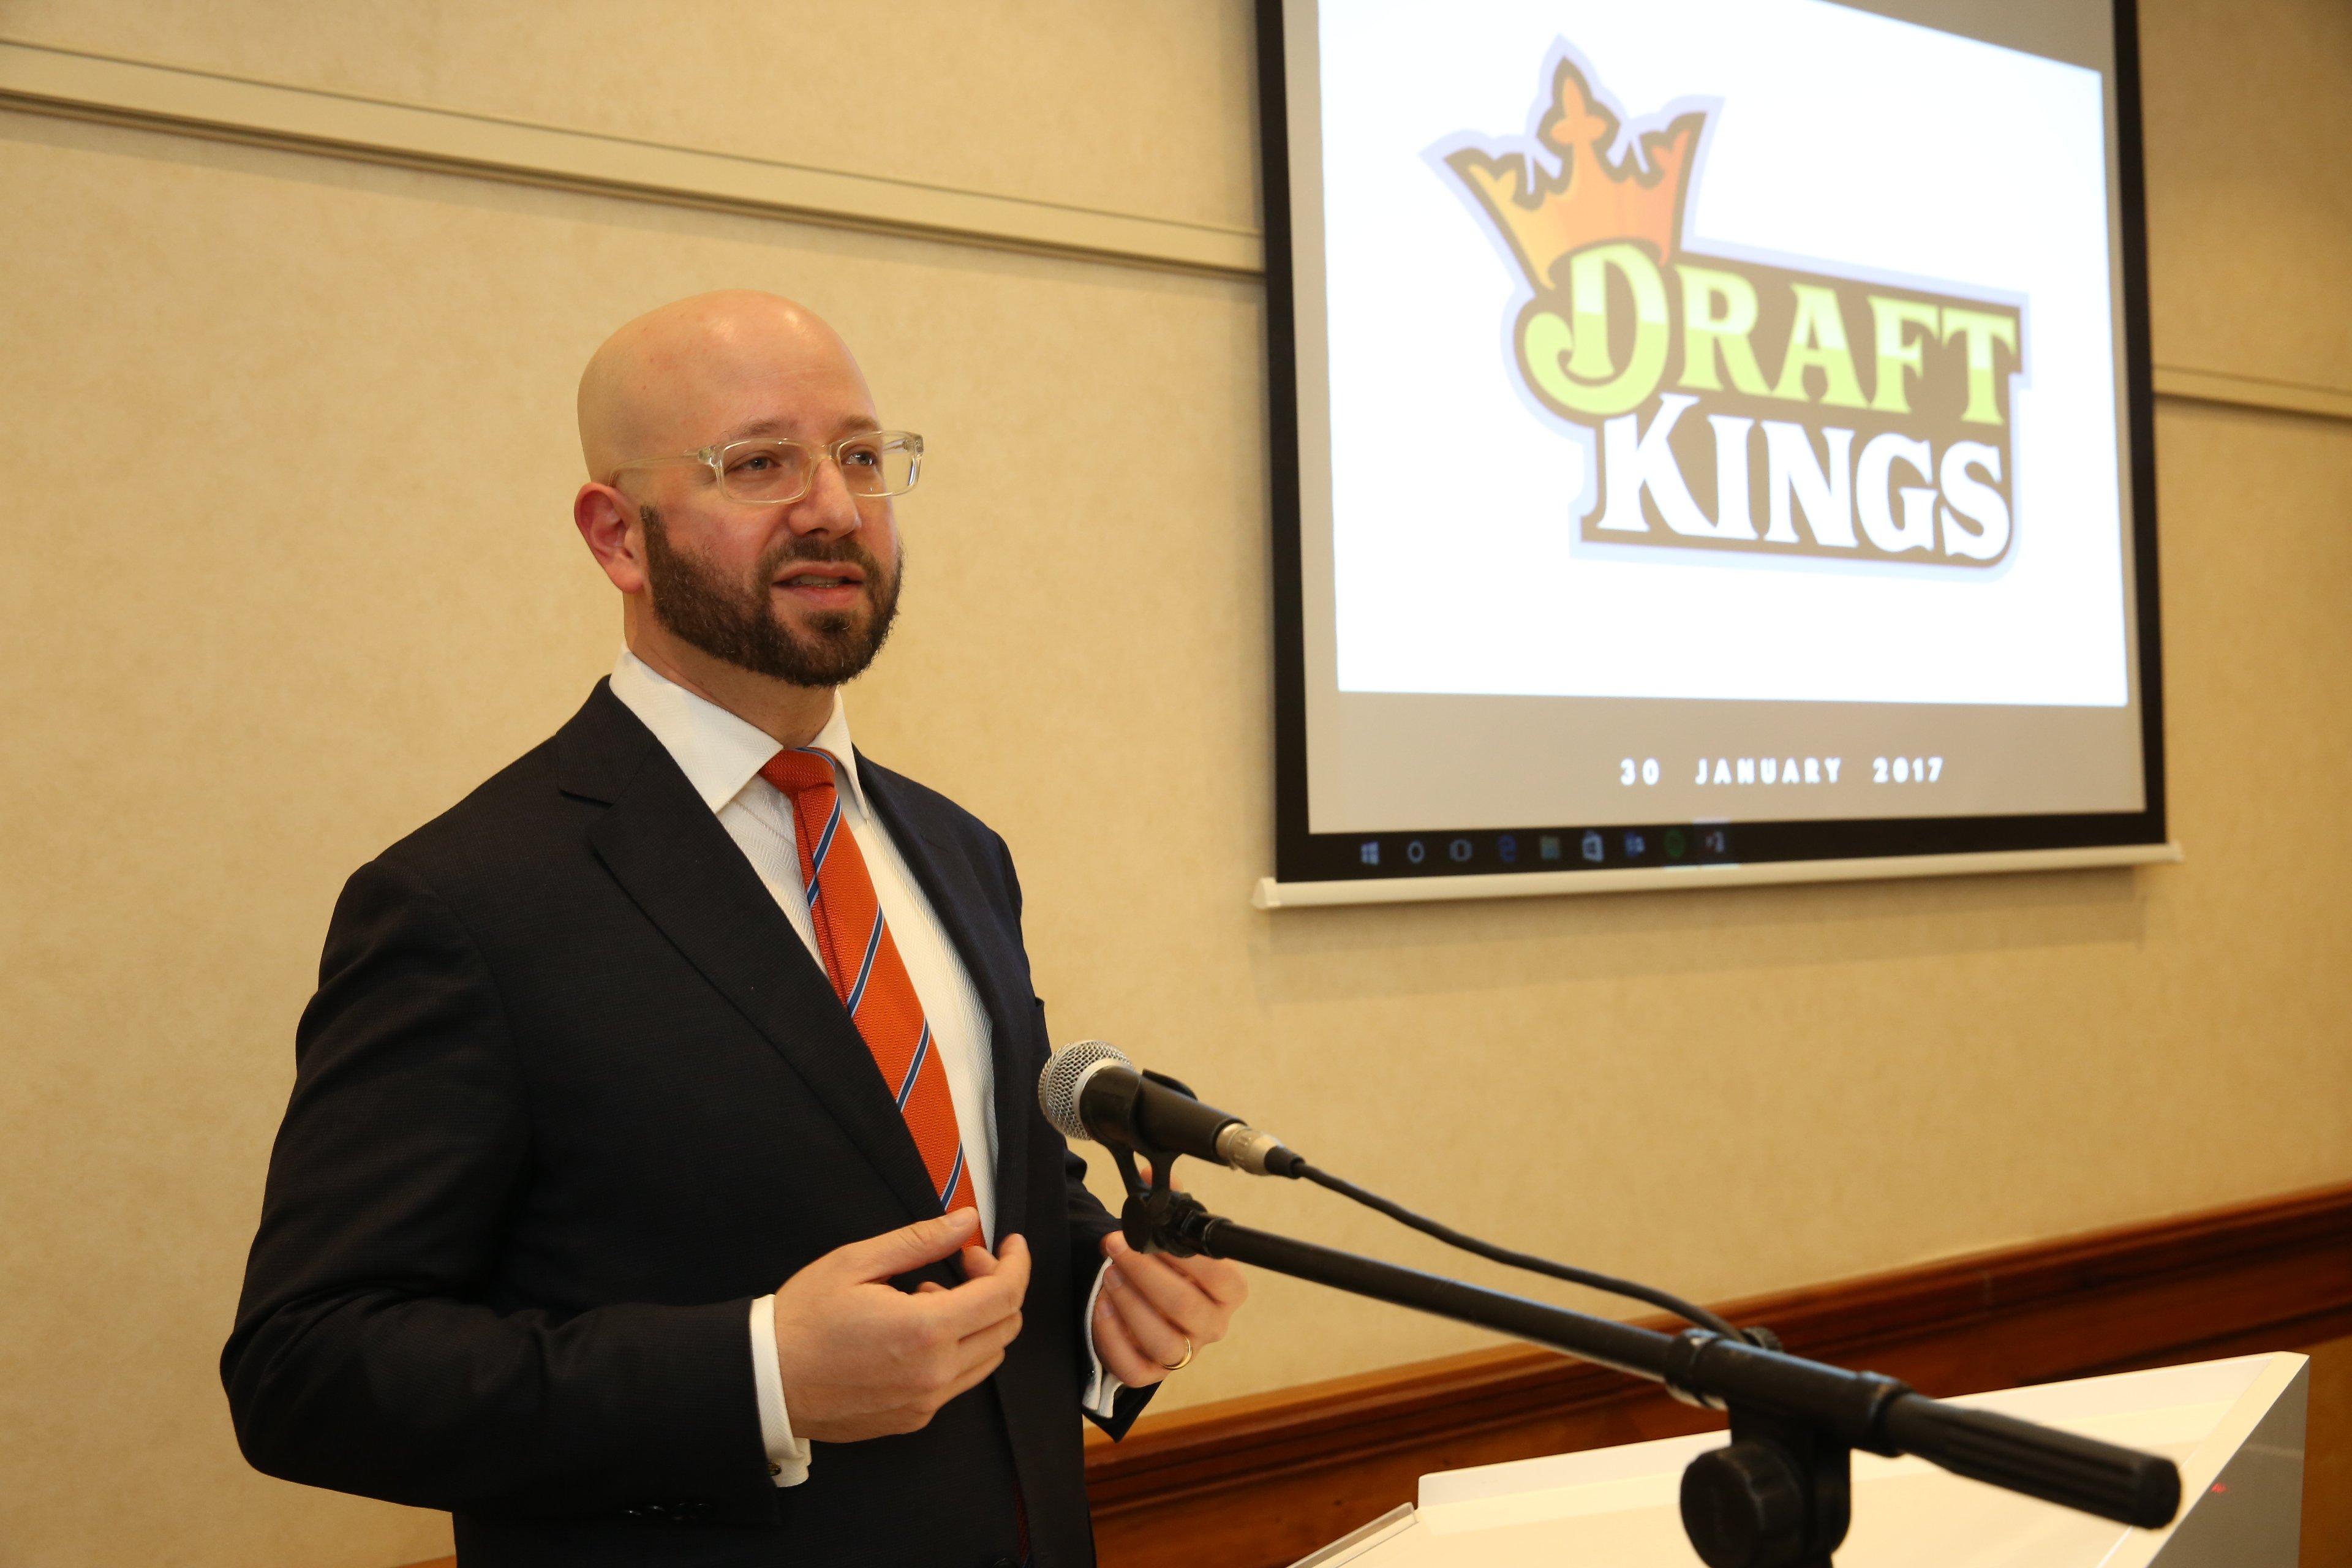 DraftKings CIO Jeffrey Haas